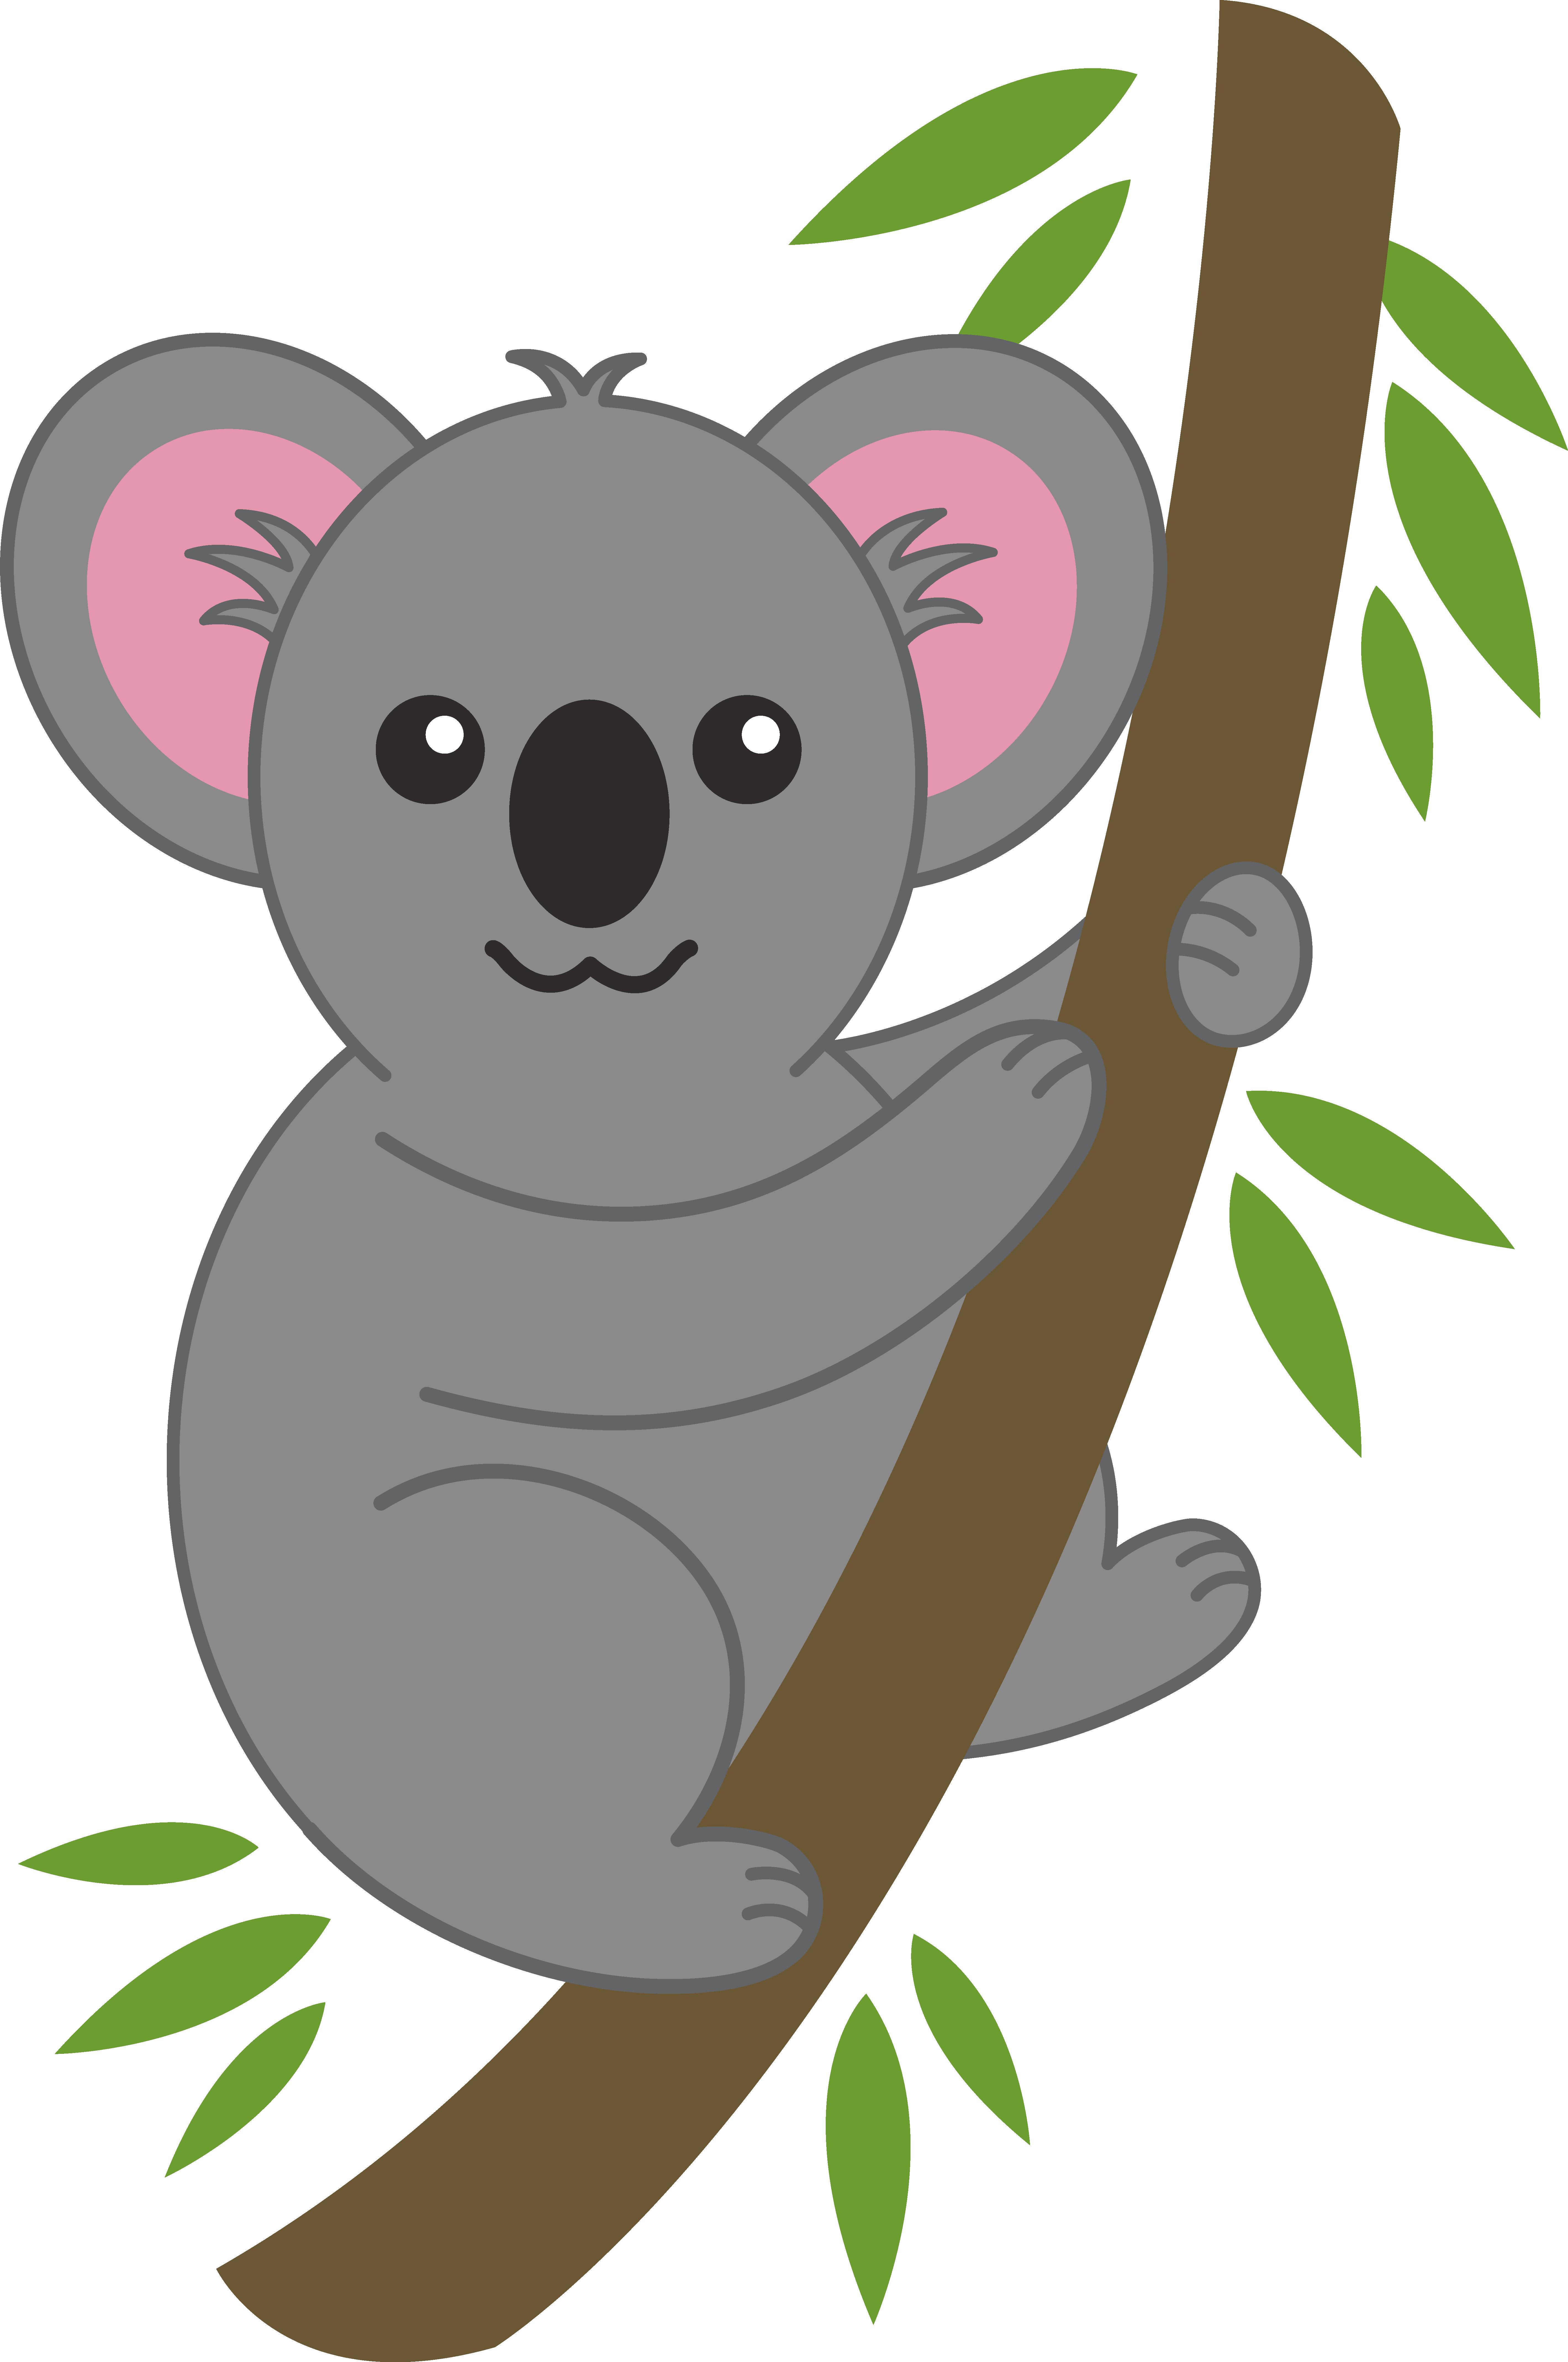 Cute Koala On Tree Branch Free Clip Art Elephant Quilt Zoo Animal Baby Shower Cross Stitch Patterns